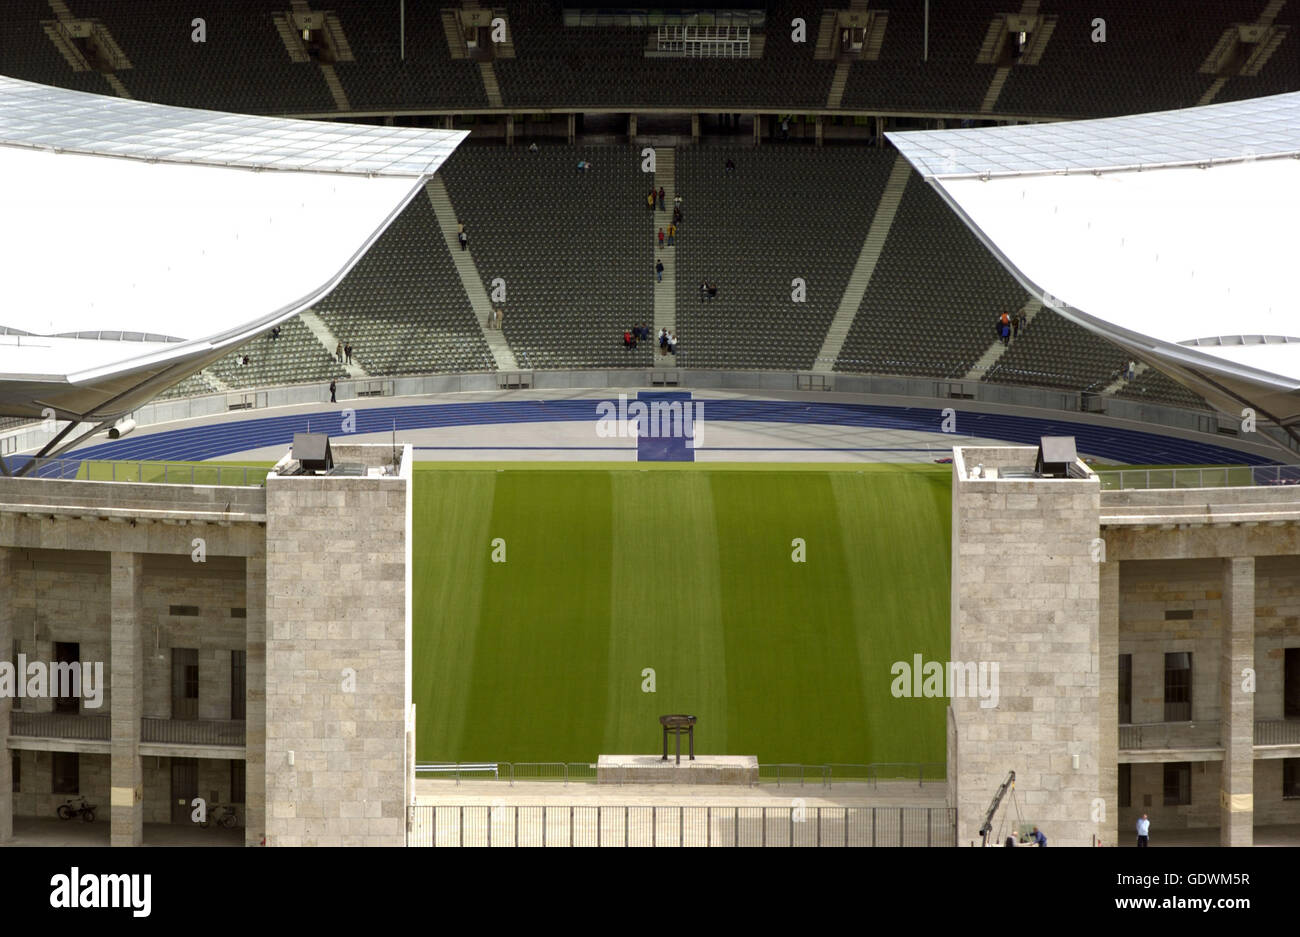 The Olympiastadion (Olympic Stadium) in Berlin - Stock Image